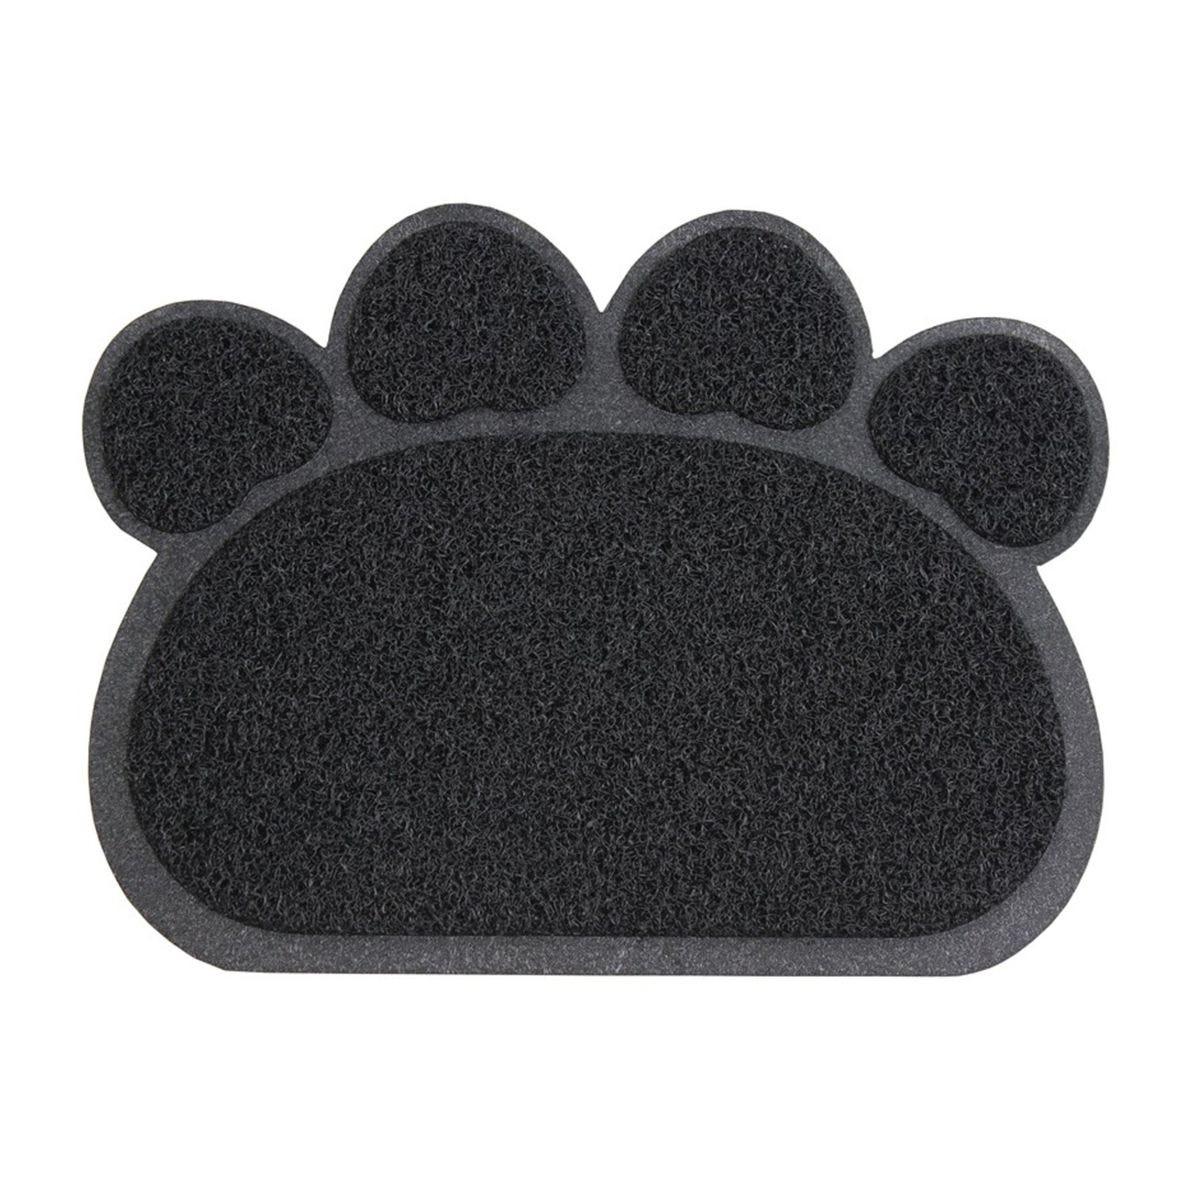 JVL 45x60cm Paw Shaped Mud Grabber Doormat - Black